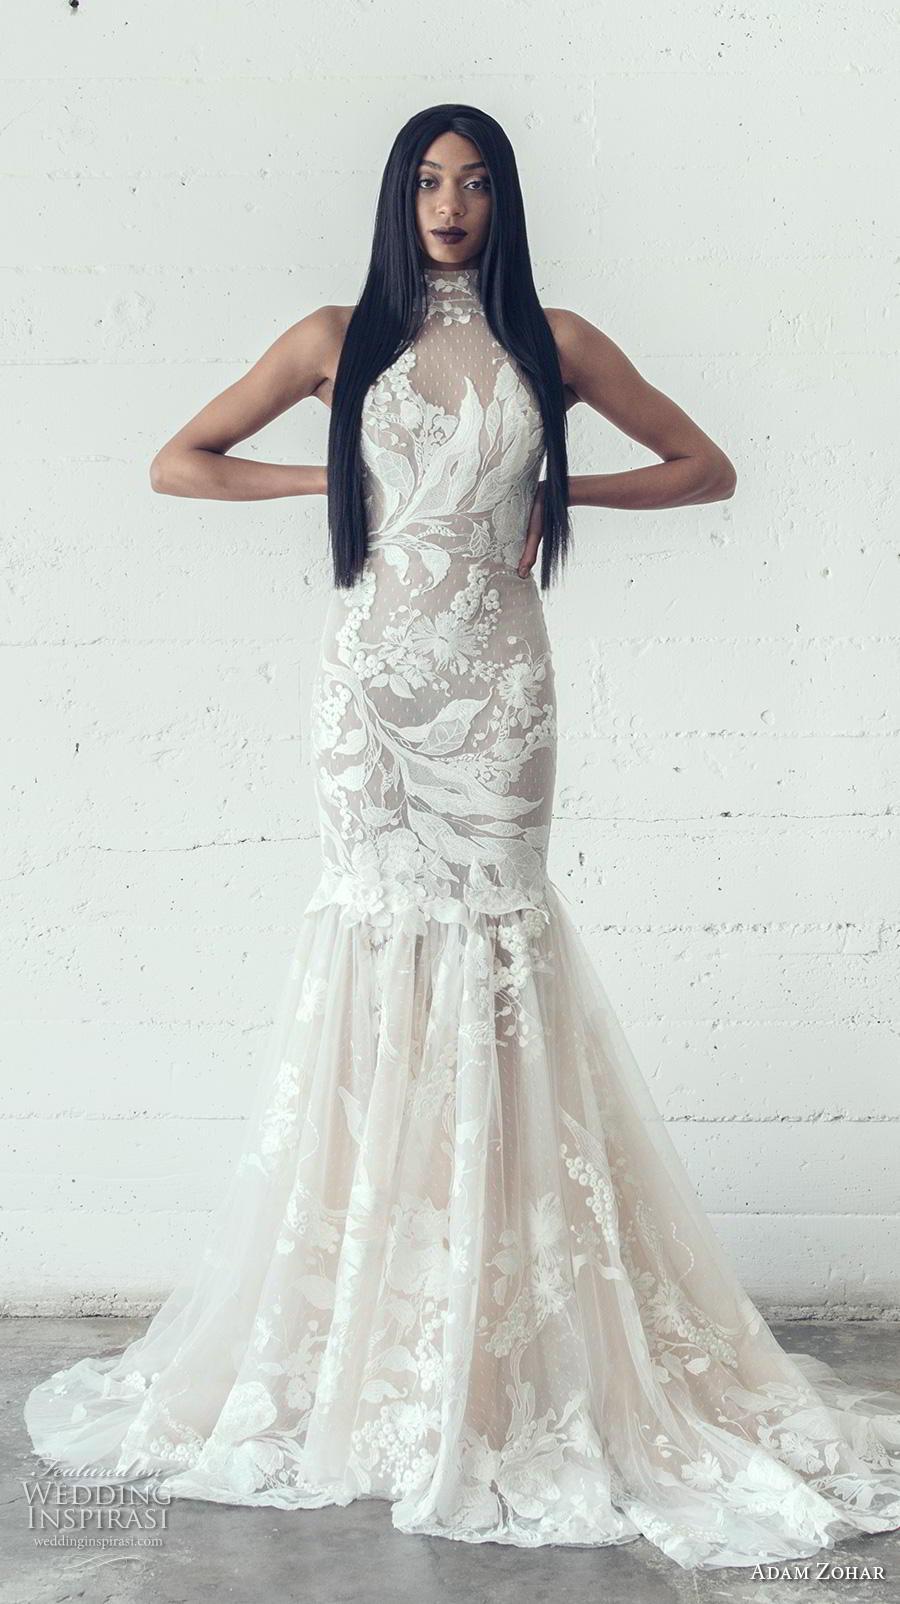 adam zohar 2019 bridal sleeveless halter high neck full embellishment elegant trumpet wedding dress keyhole back medium train (12) mv